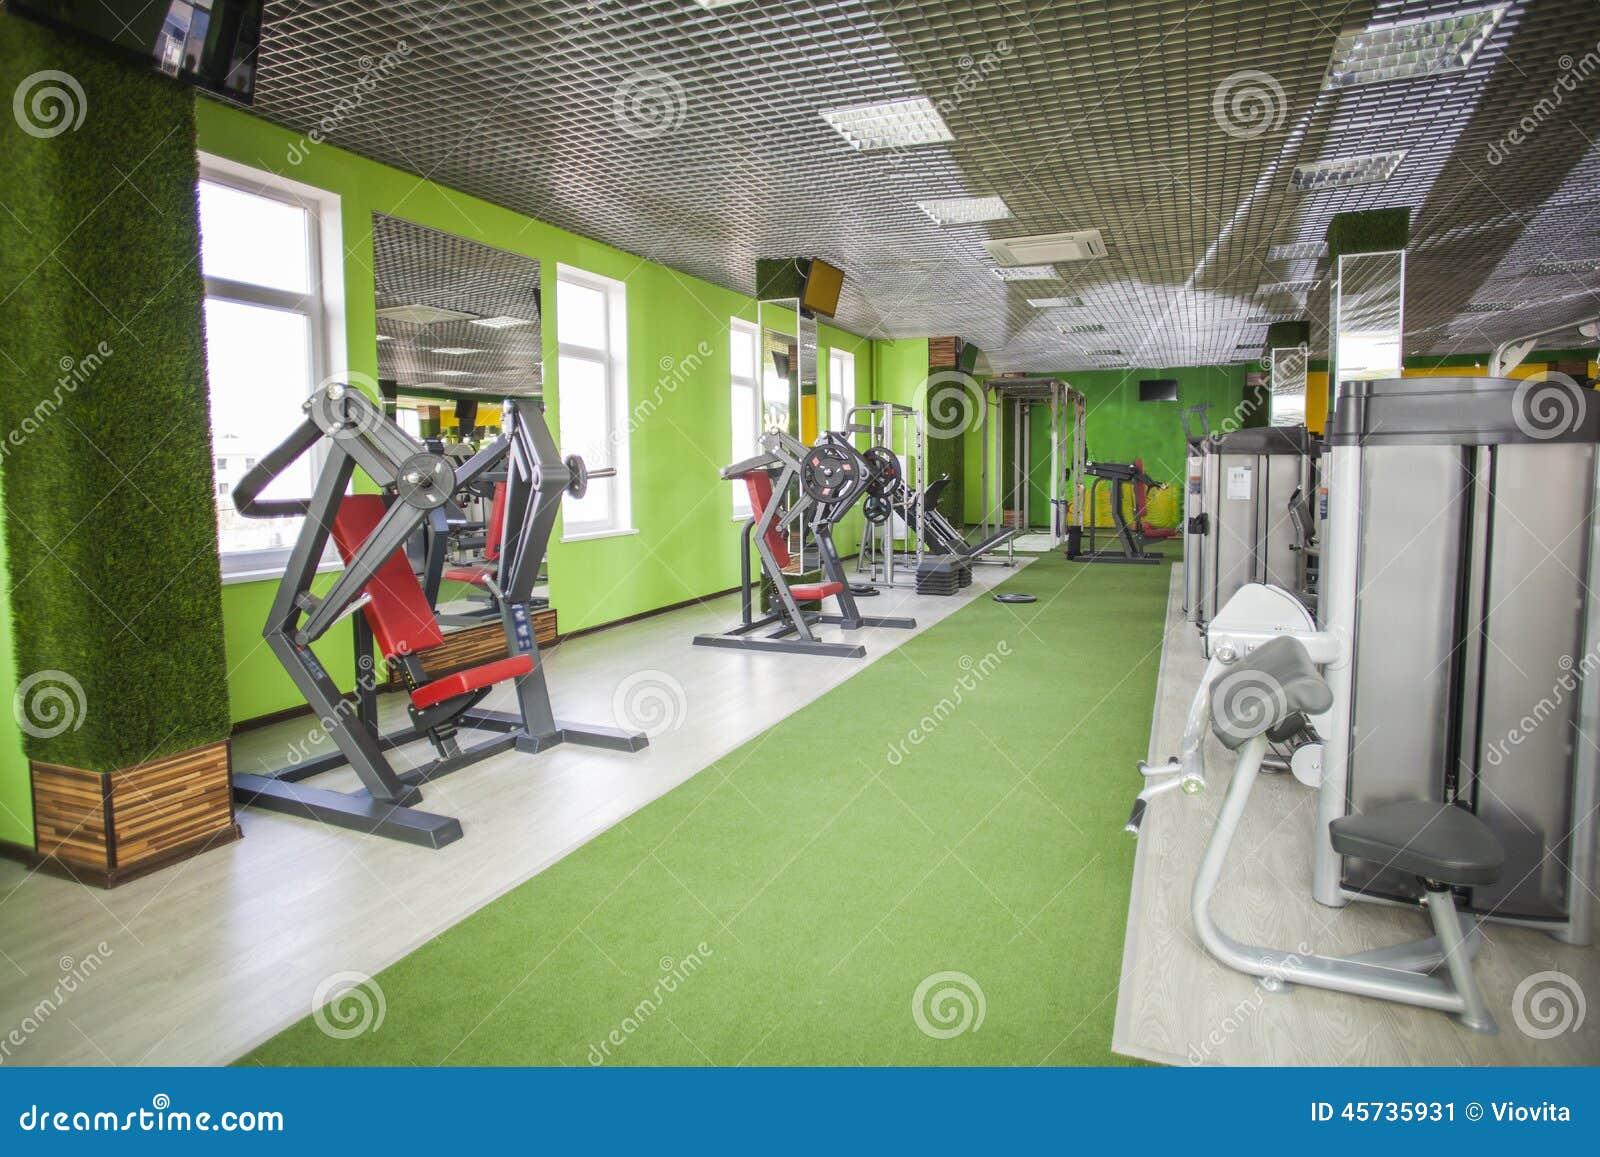 Gym equipment room stock photo image